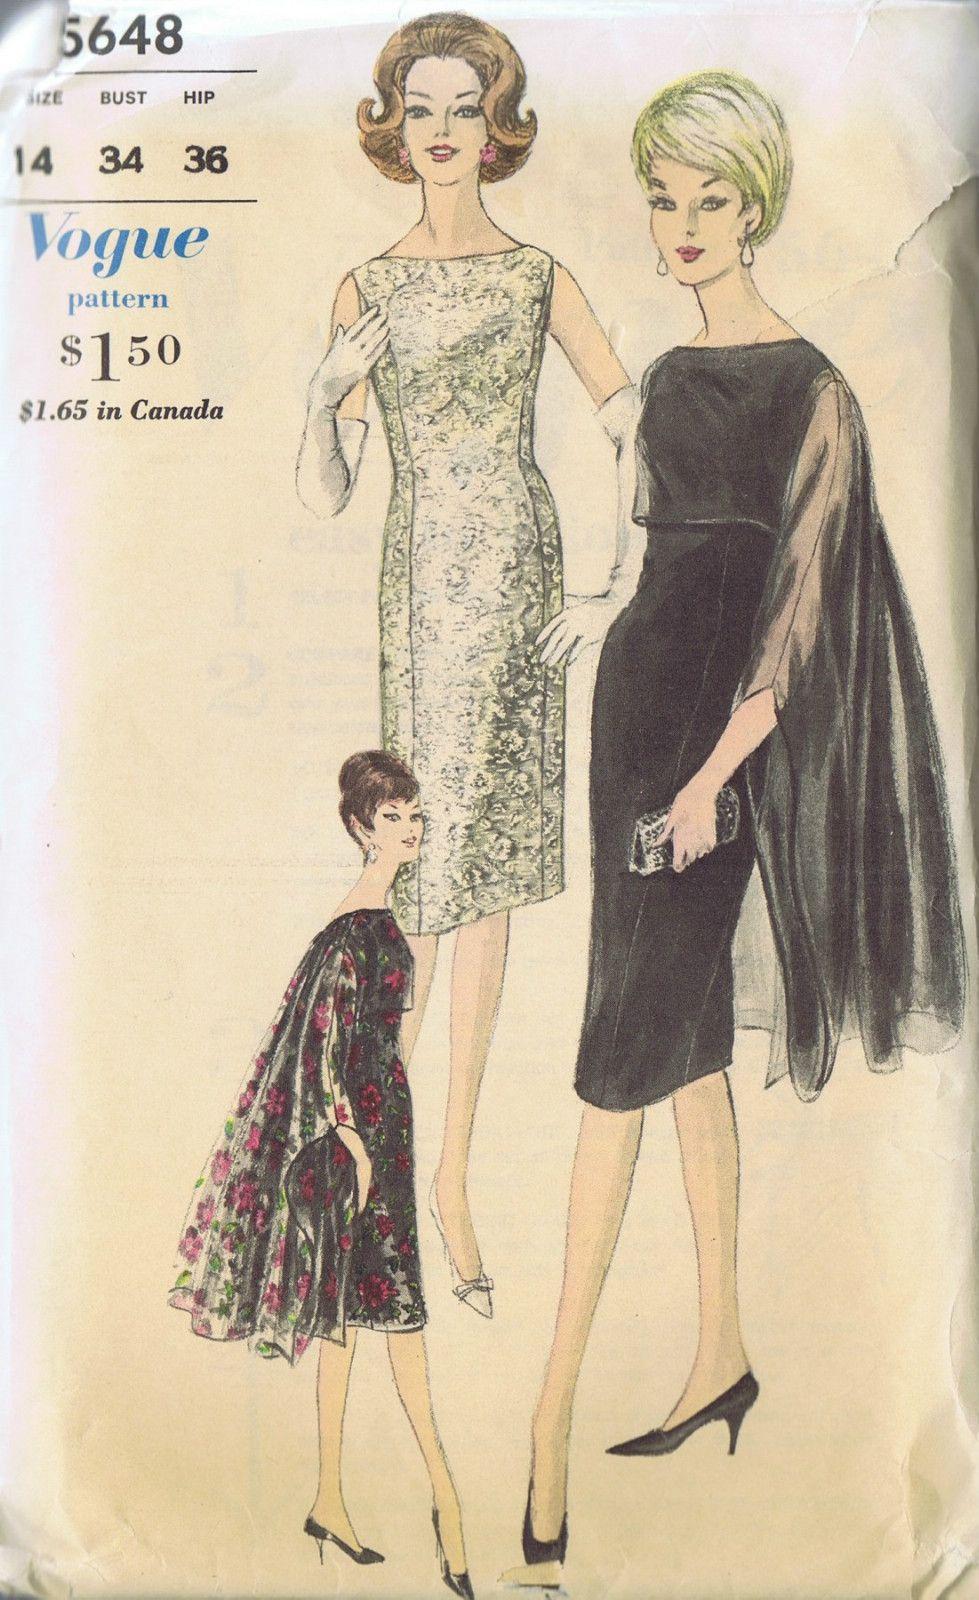 Vintage dress stole cape sewing pattern 5648 vogue size 14 bust 34 ...